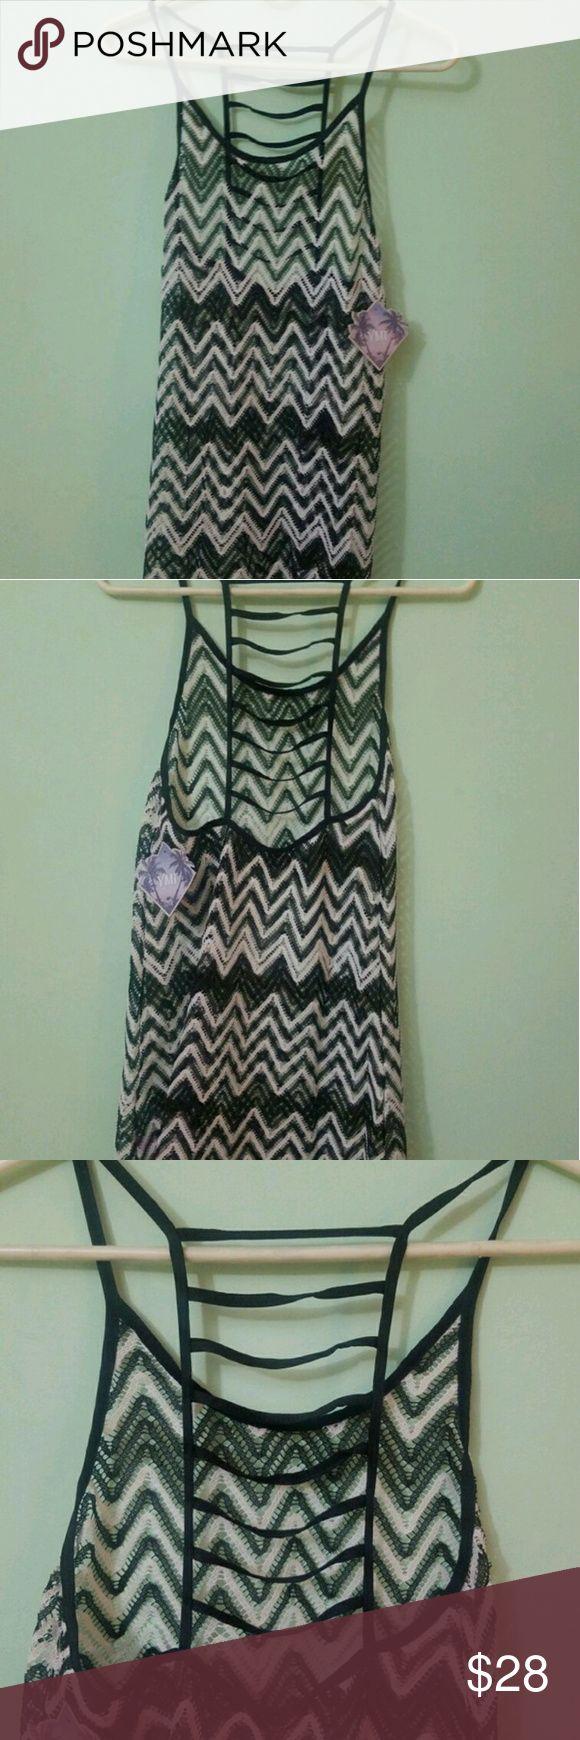 Selling this Yumi swim cover up dress on Poshmark! My username is: jennystudio. #shopmycloset #poshmark #fashion #shopping #style #forsale #yumi #Other